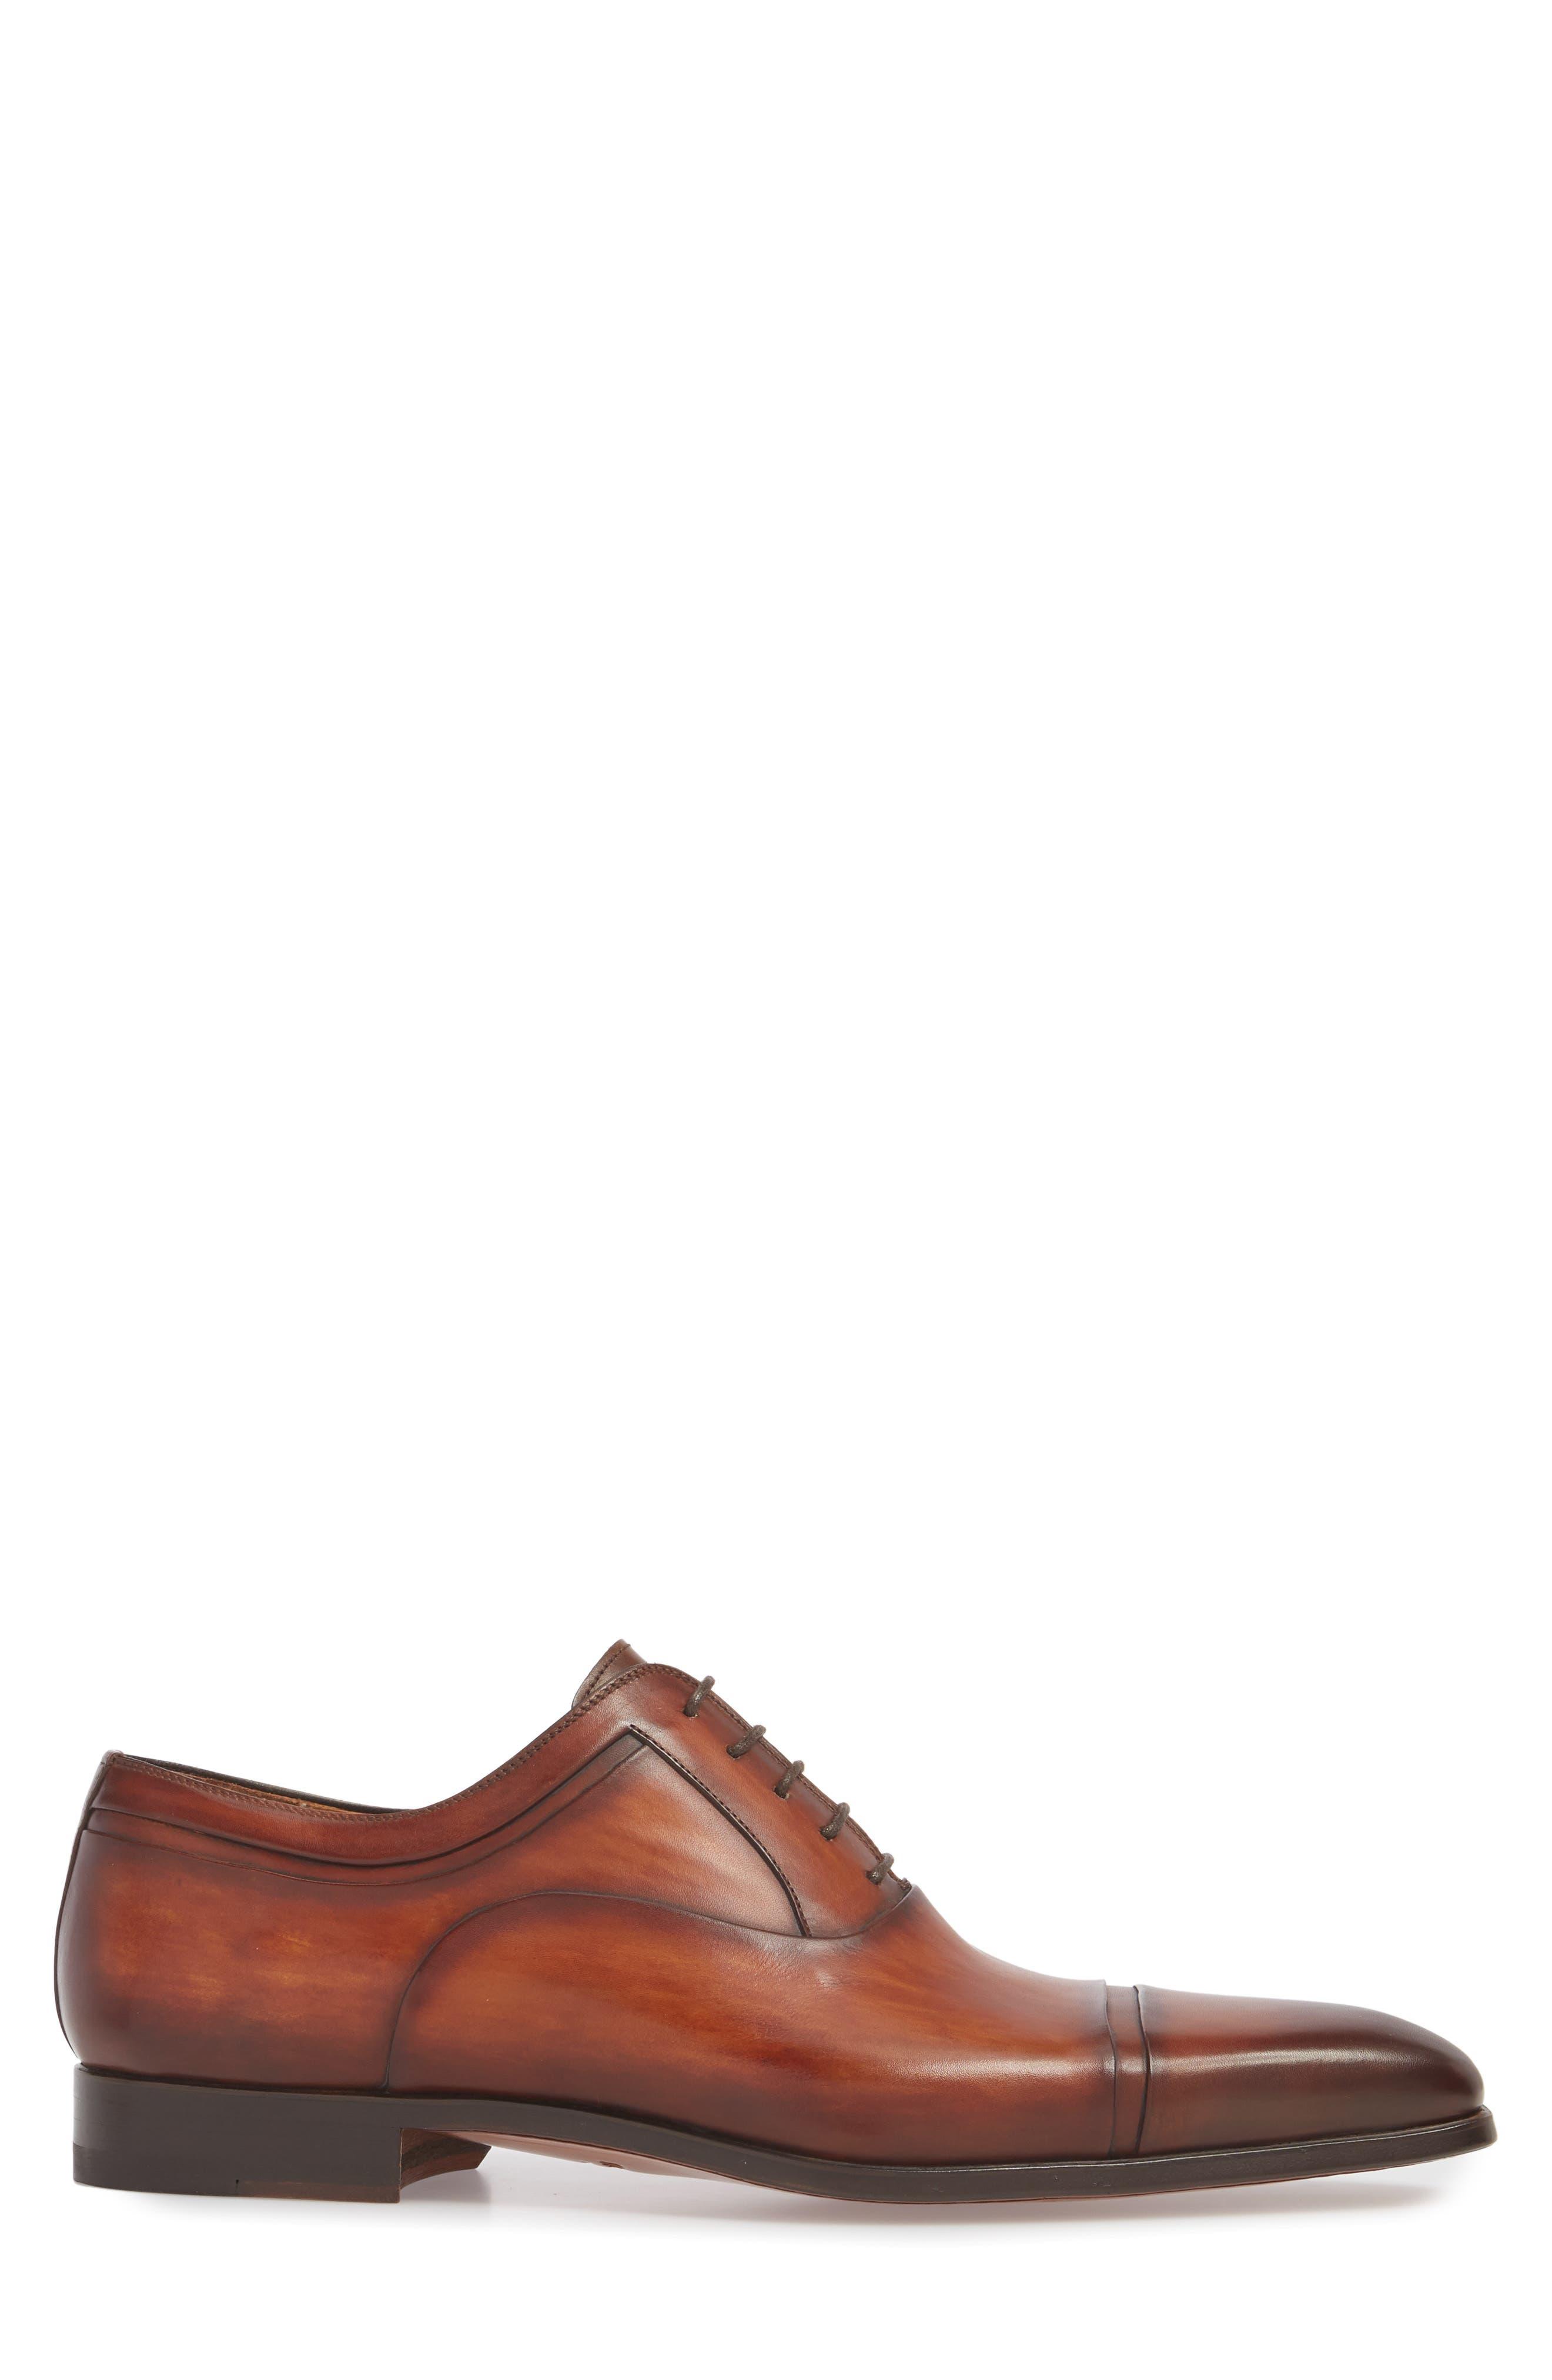 Tobin Cap Toe Oxford,                             Alternate thumbnail 3, color,                             Cognac Leather